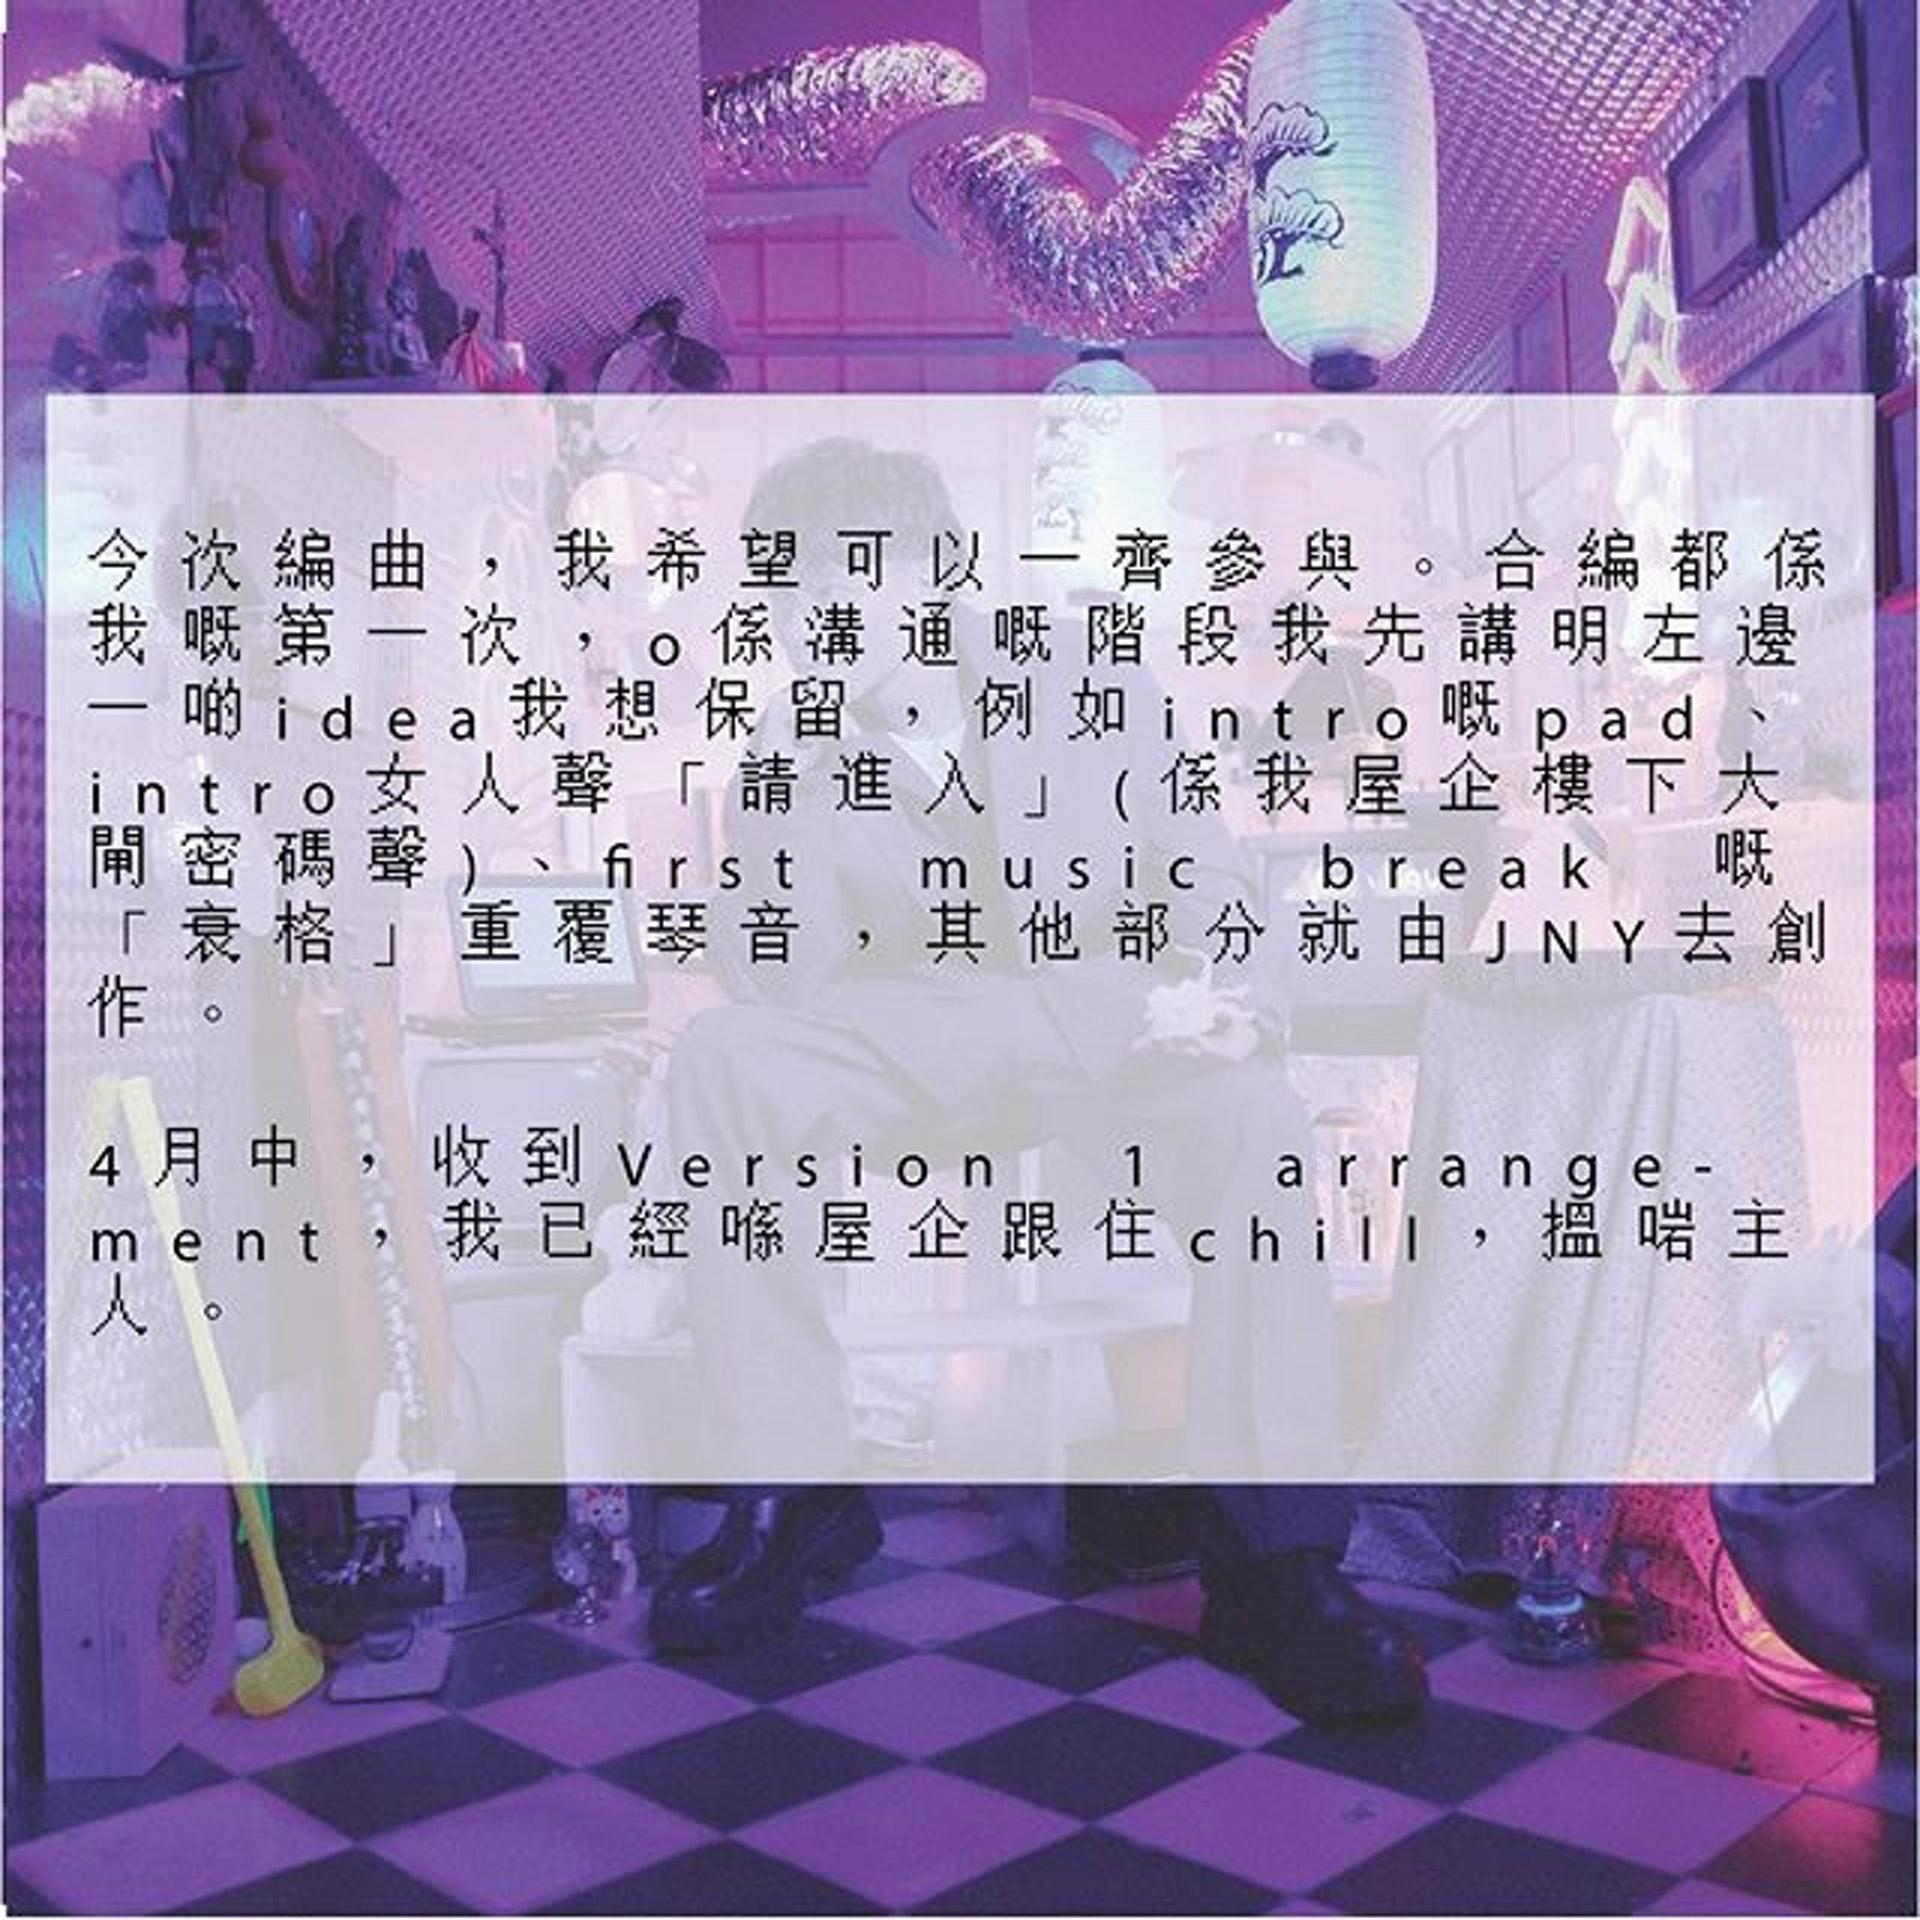 (陳健安Instagram圖片)